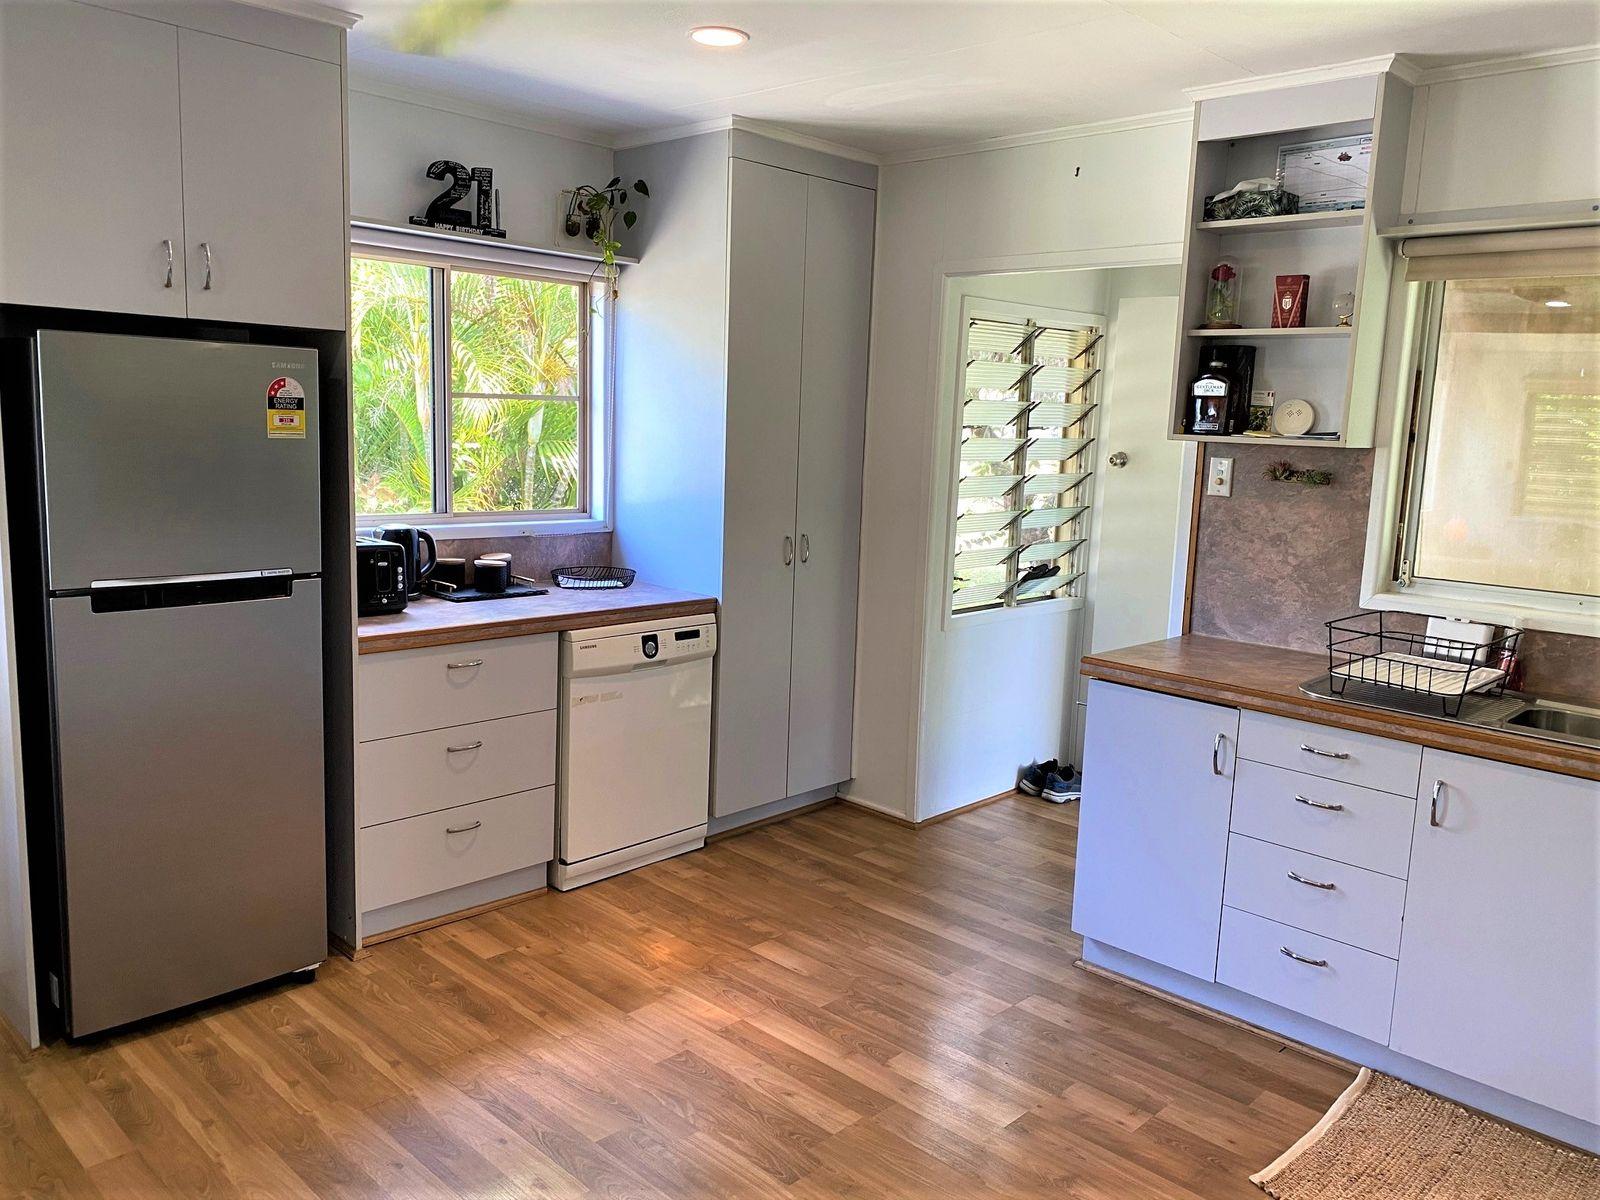 44 Anzac Street, Sarina, QLD 4737